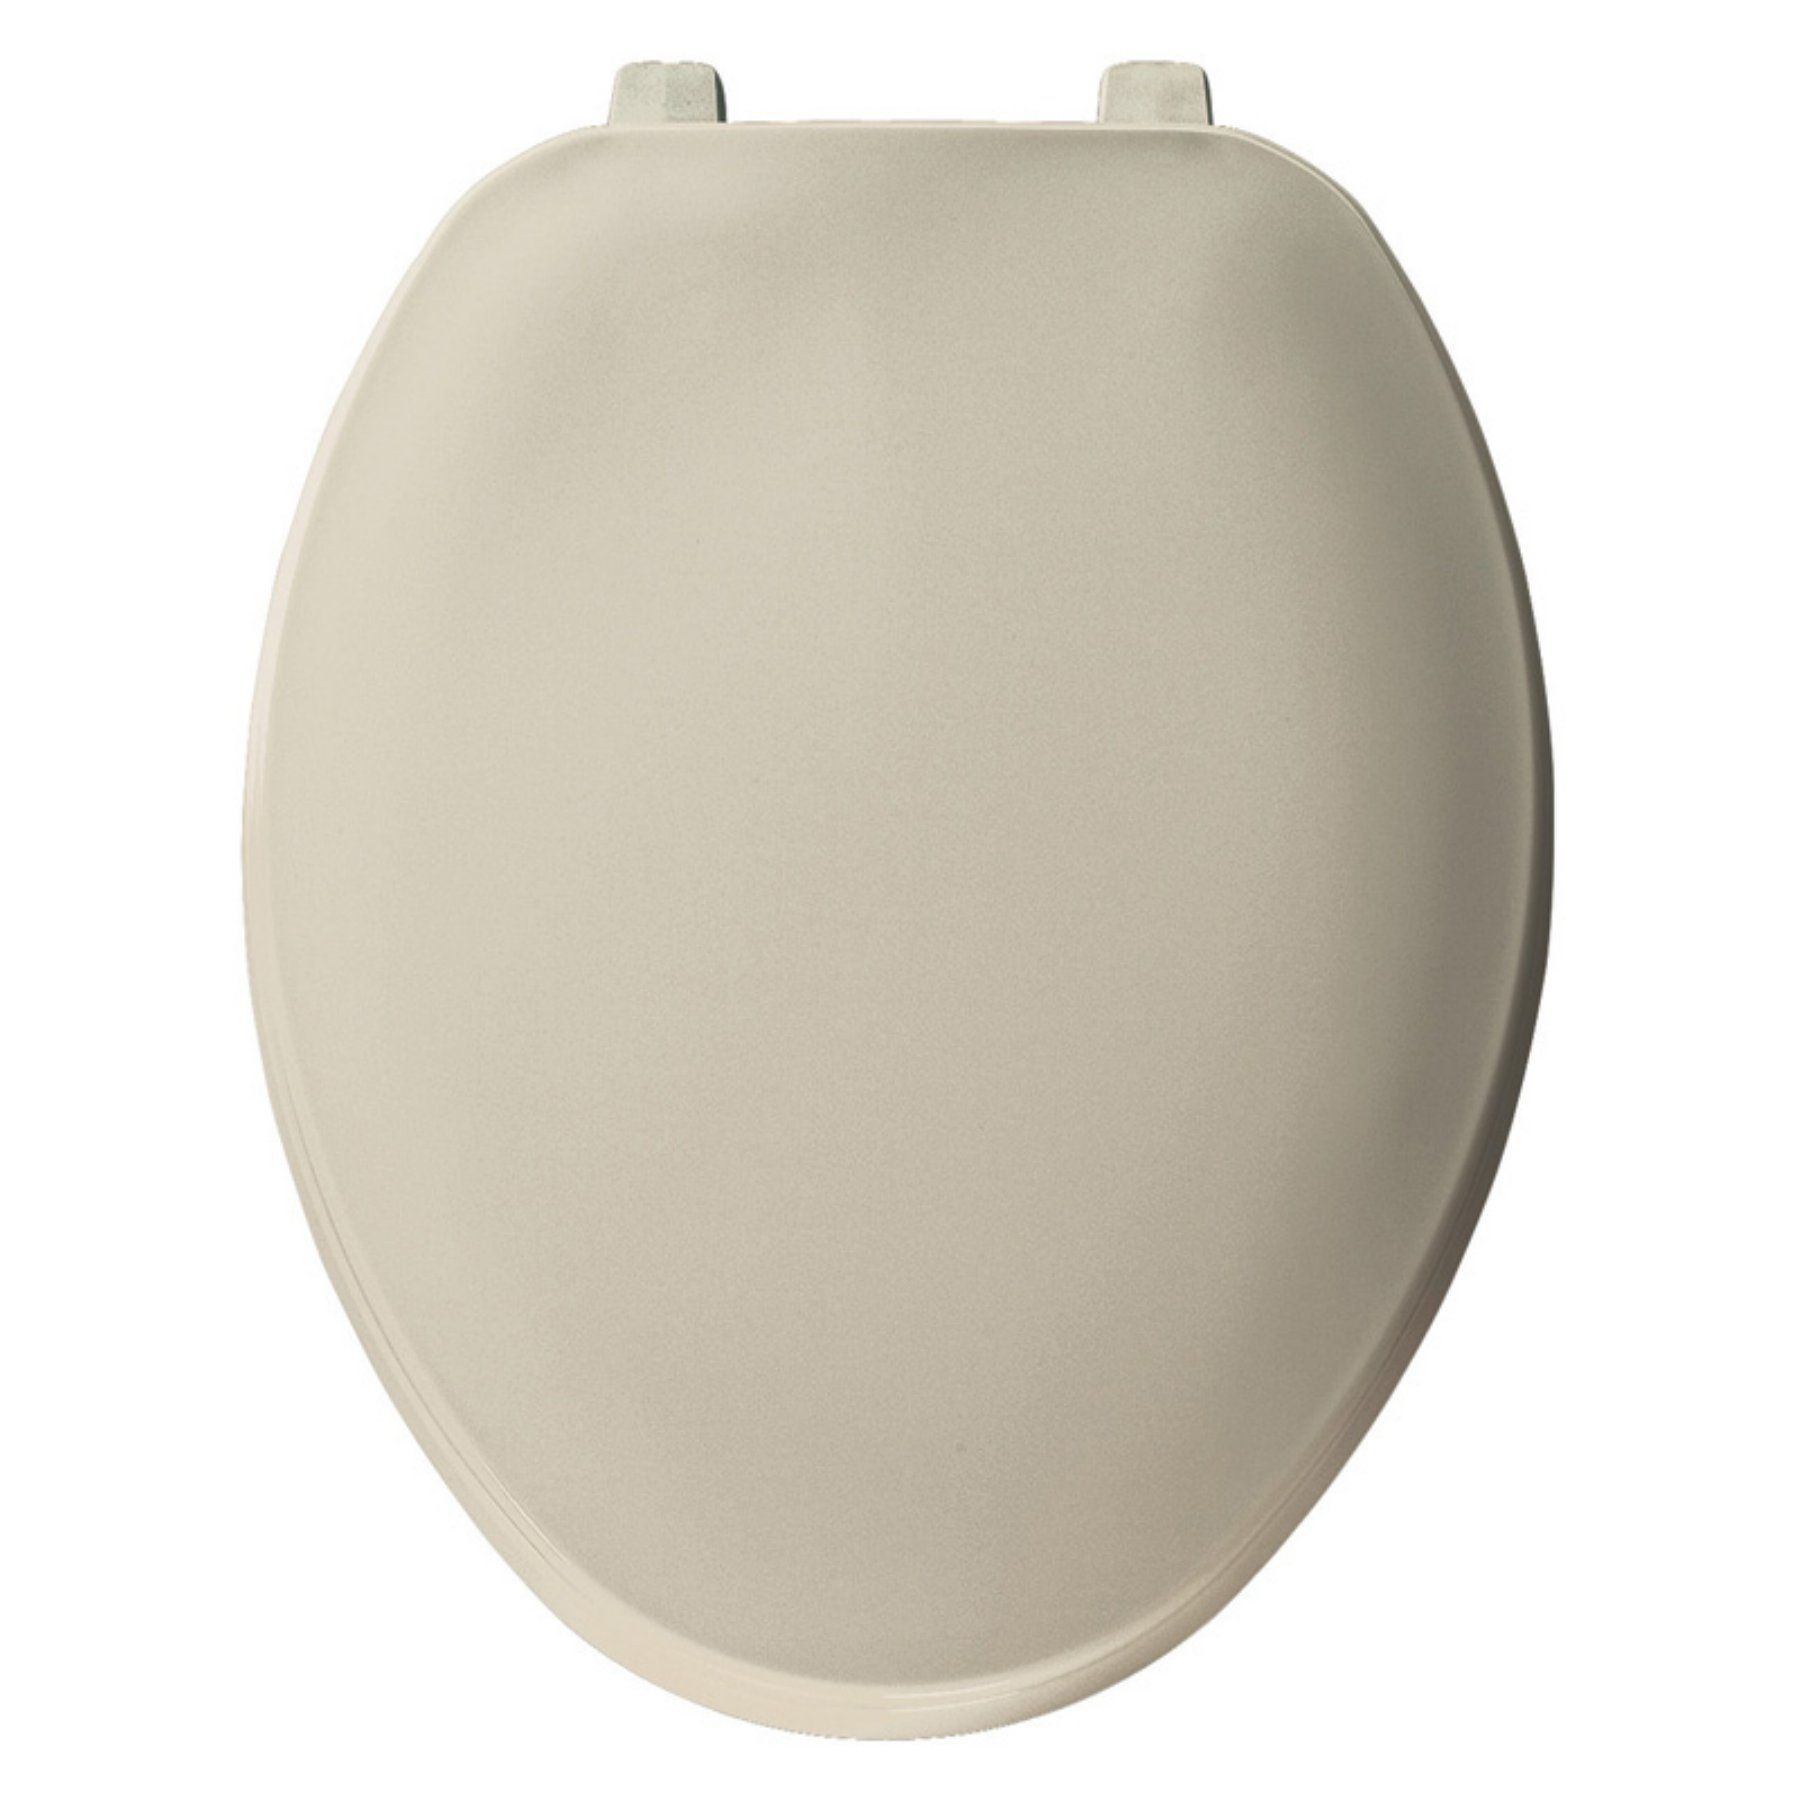 Bemis B170006 Elongated Closed Front Whisper Close Toilet